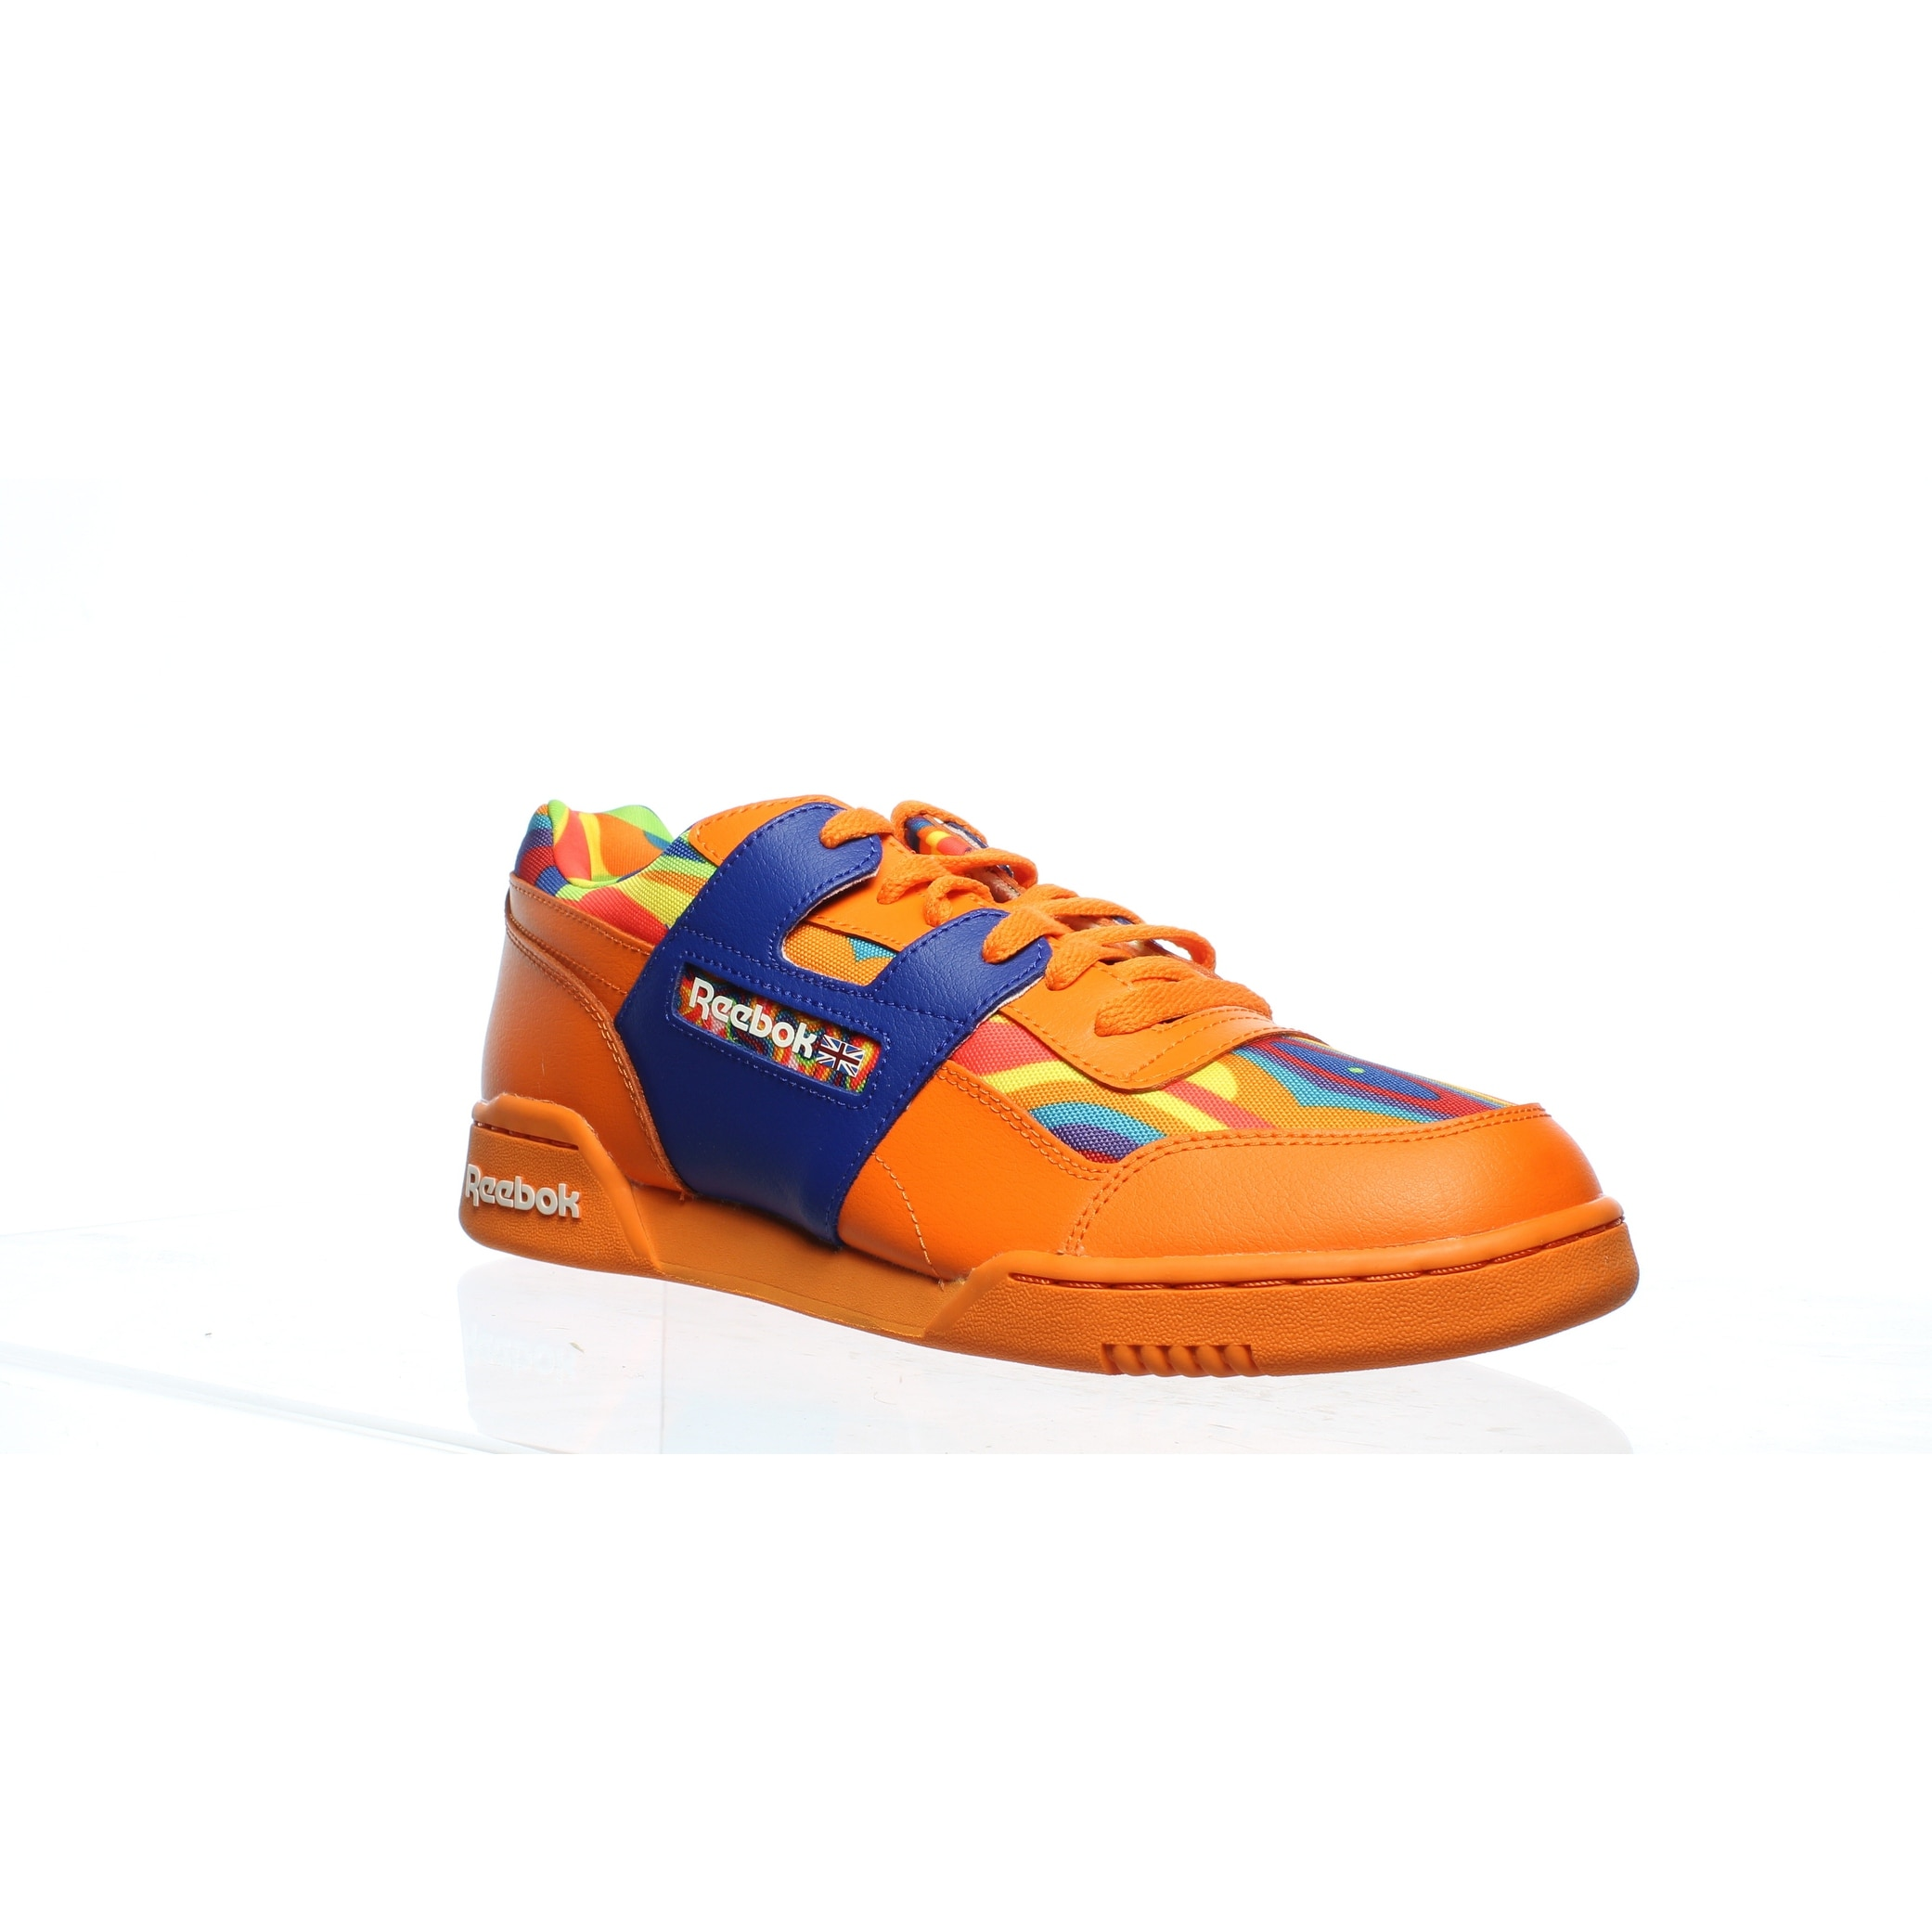 Reebok Mens Workout Plus Ws Orange Cross Training Shoes Size 10